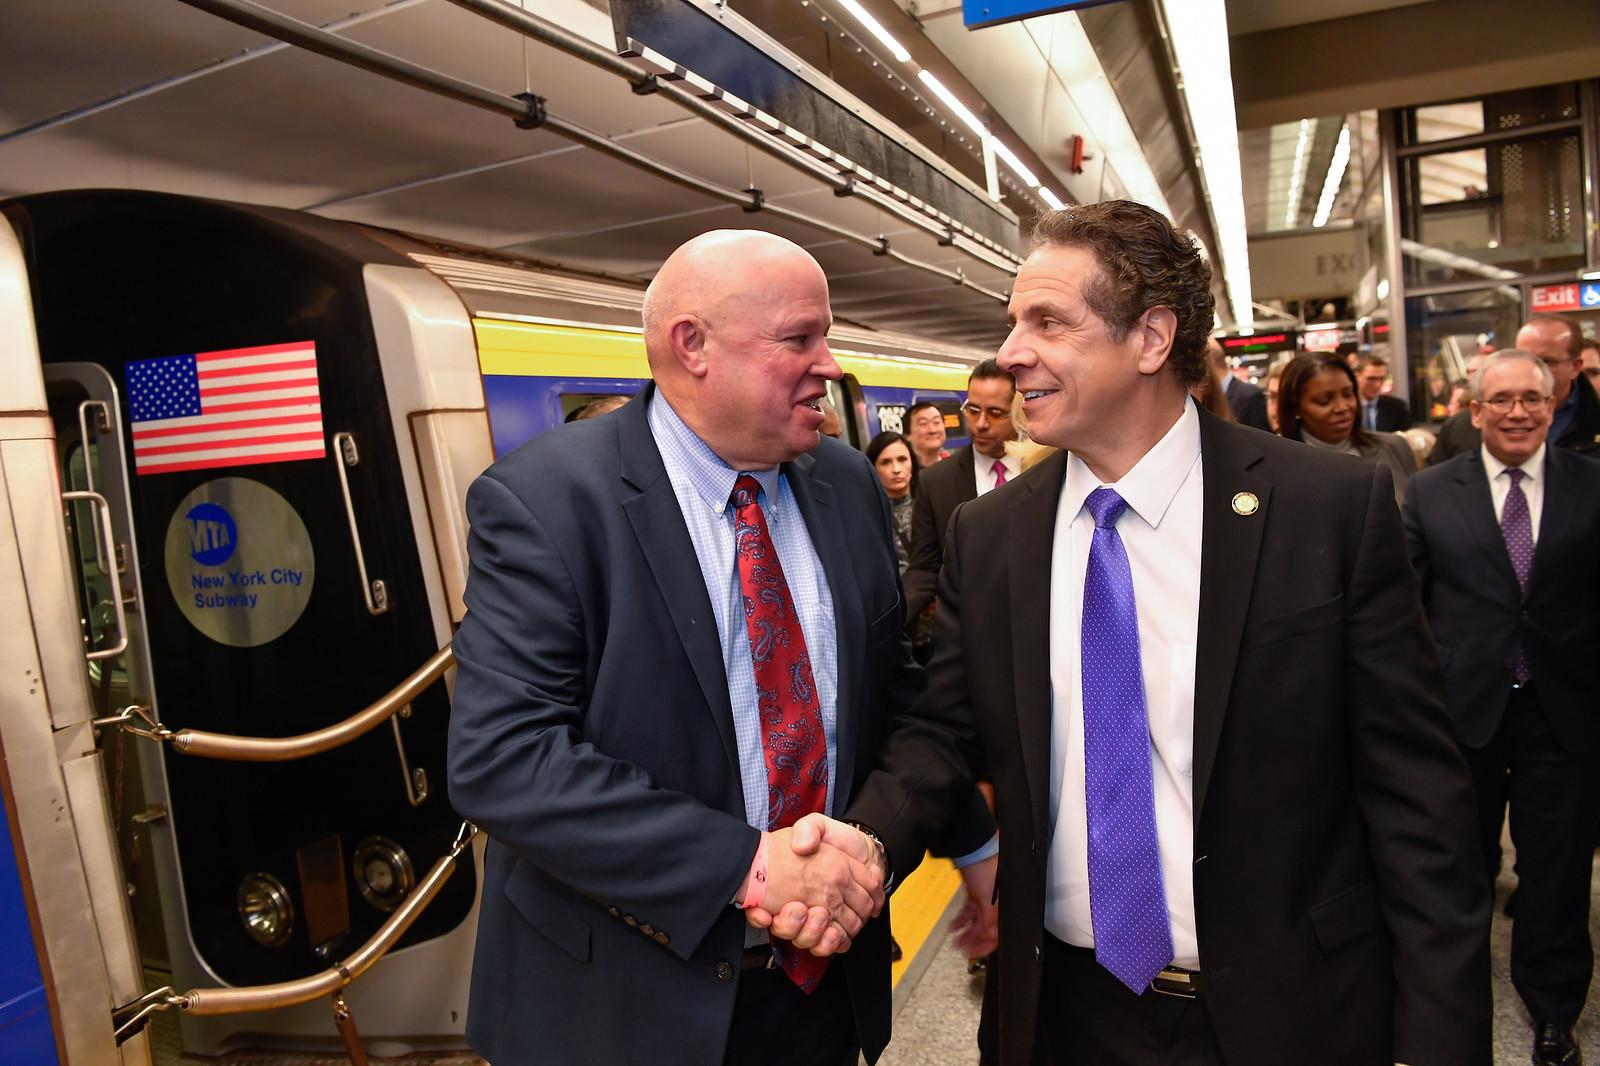 Governor Cuomo Takes Inaugural Ride of the Second Avenue Subway